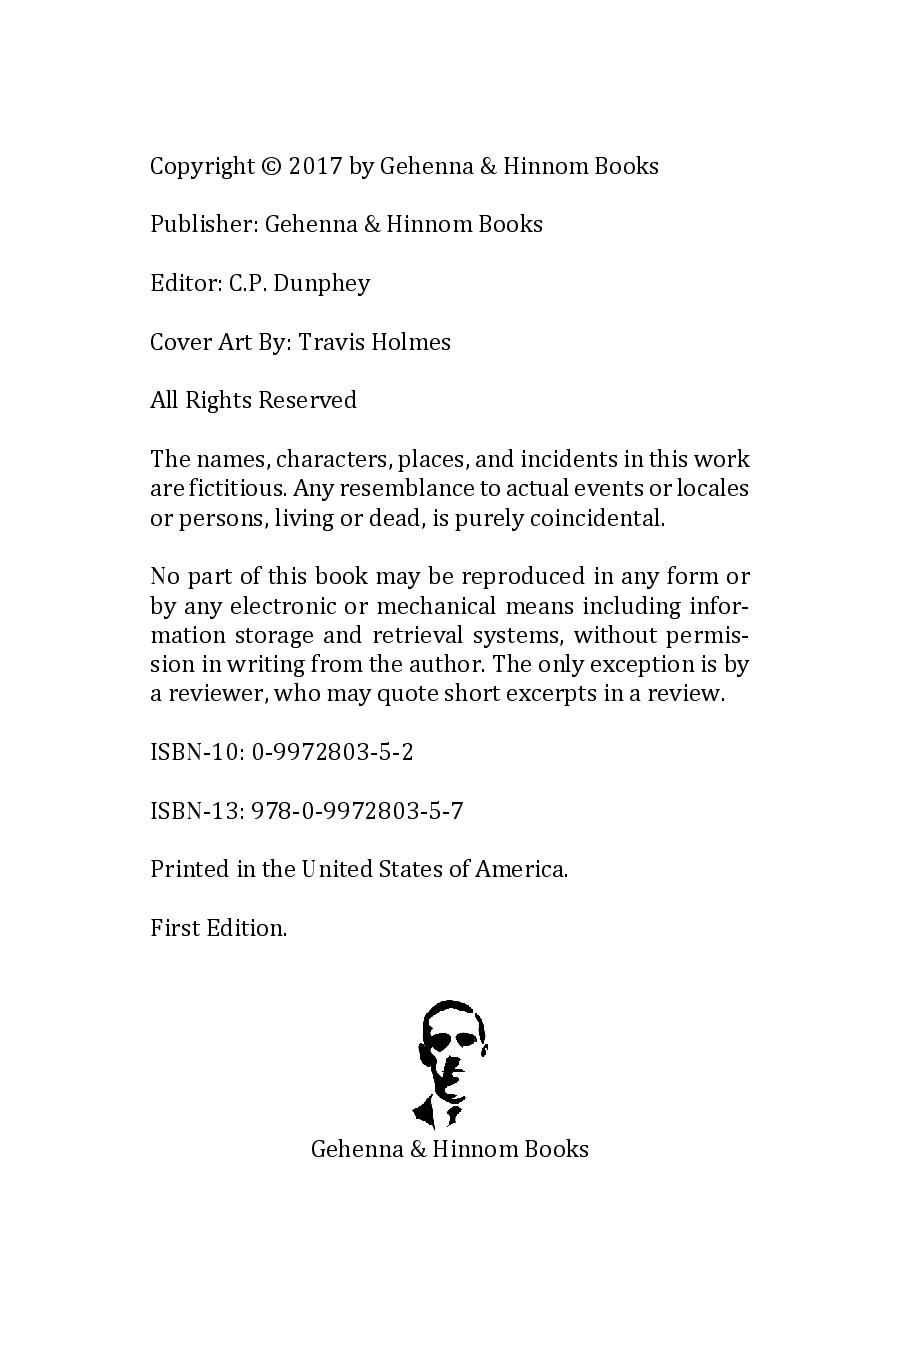 Hinnom Magazine 003 Manuscript Print-page-002